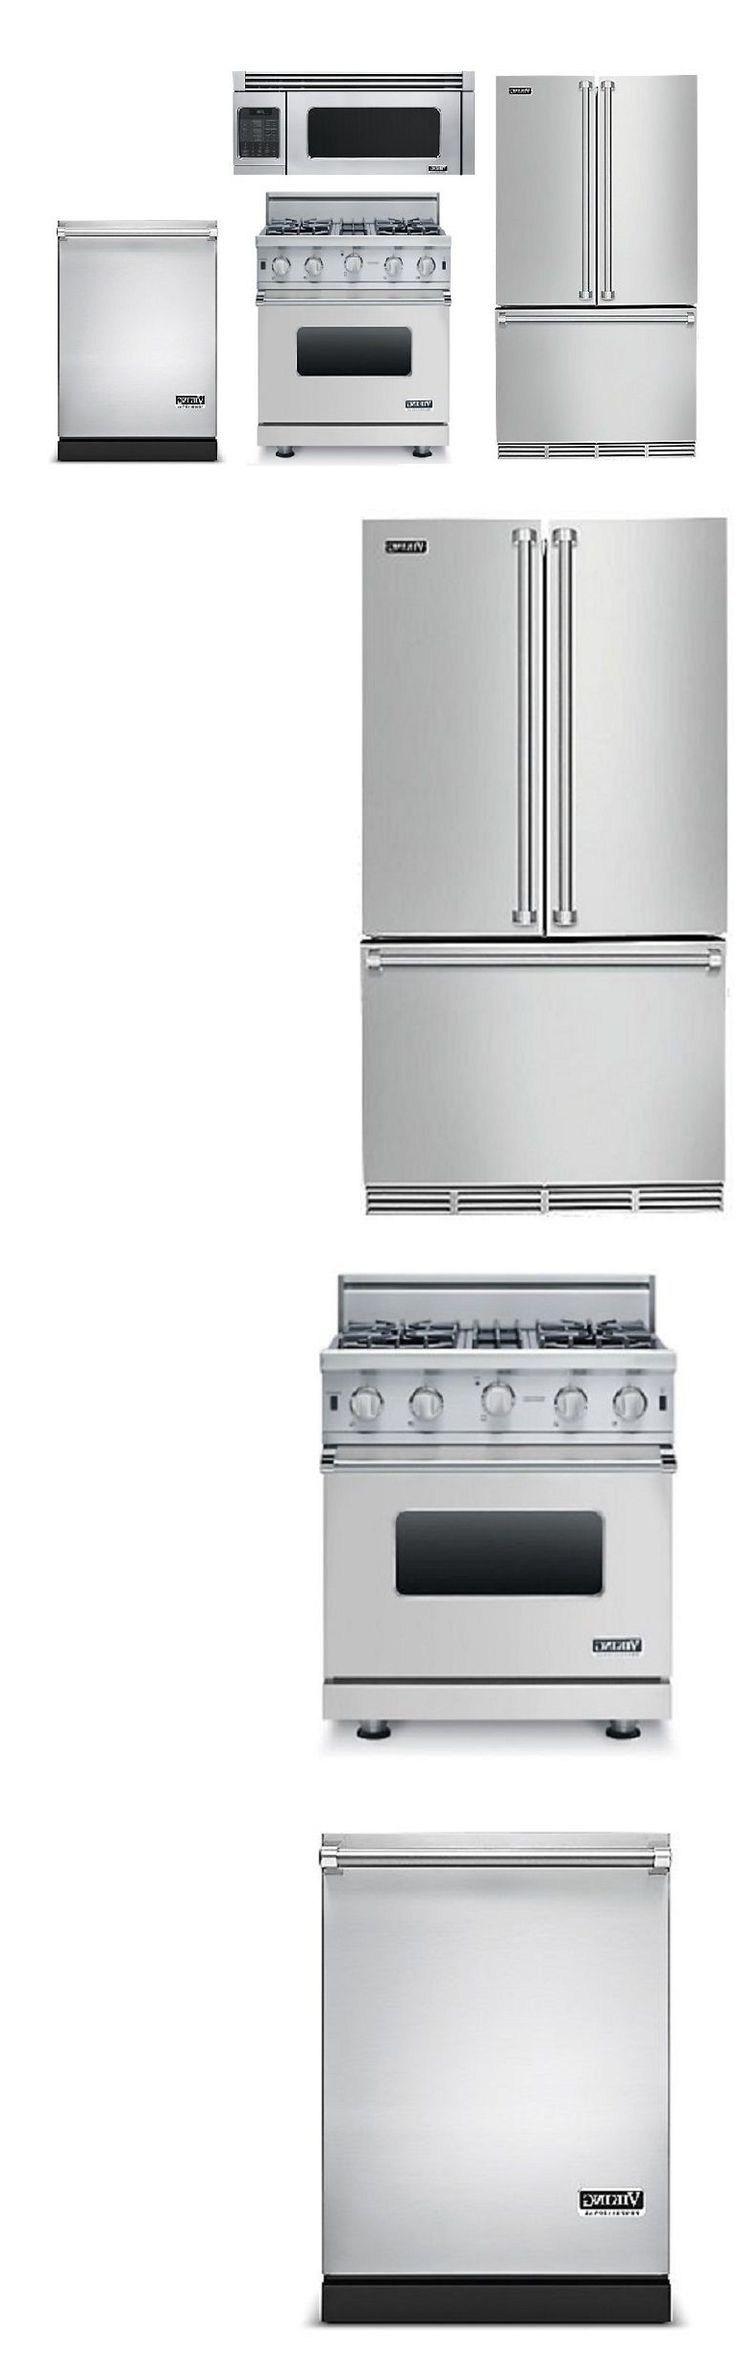 Brandsmart Appliance Packages Appliances Ideas From Brandsmart Kitchen Appliances